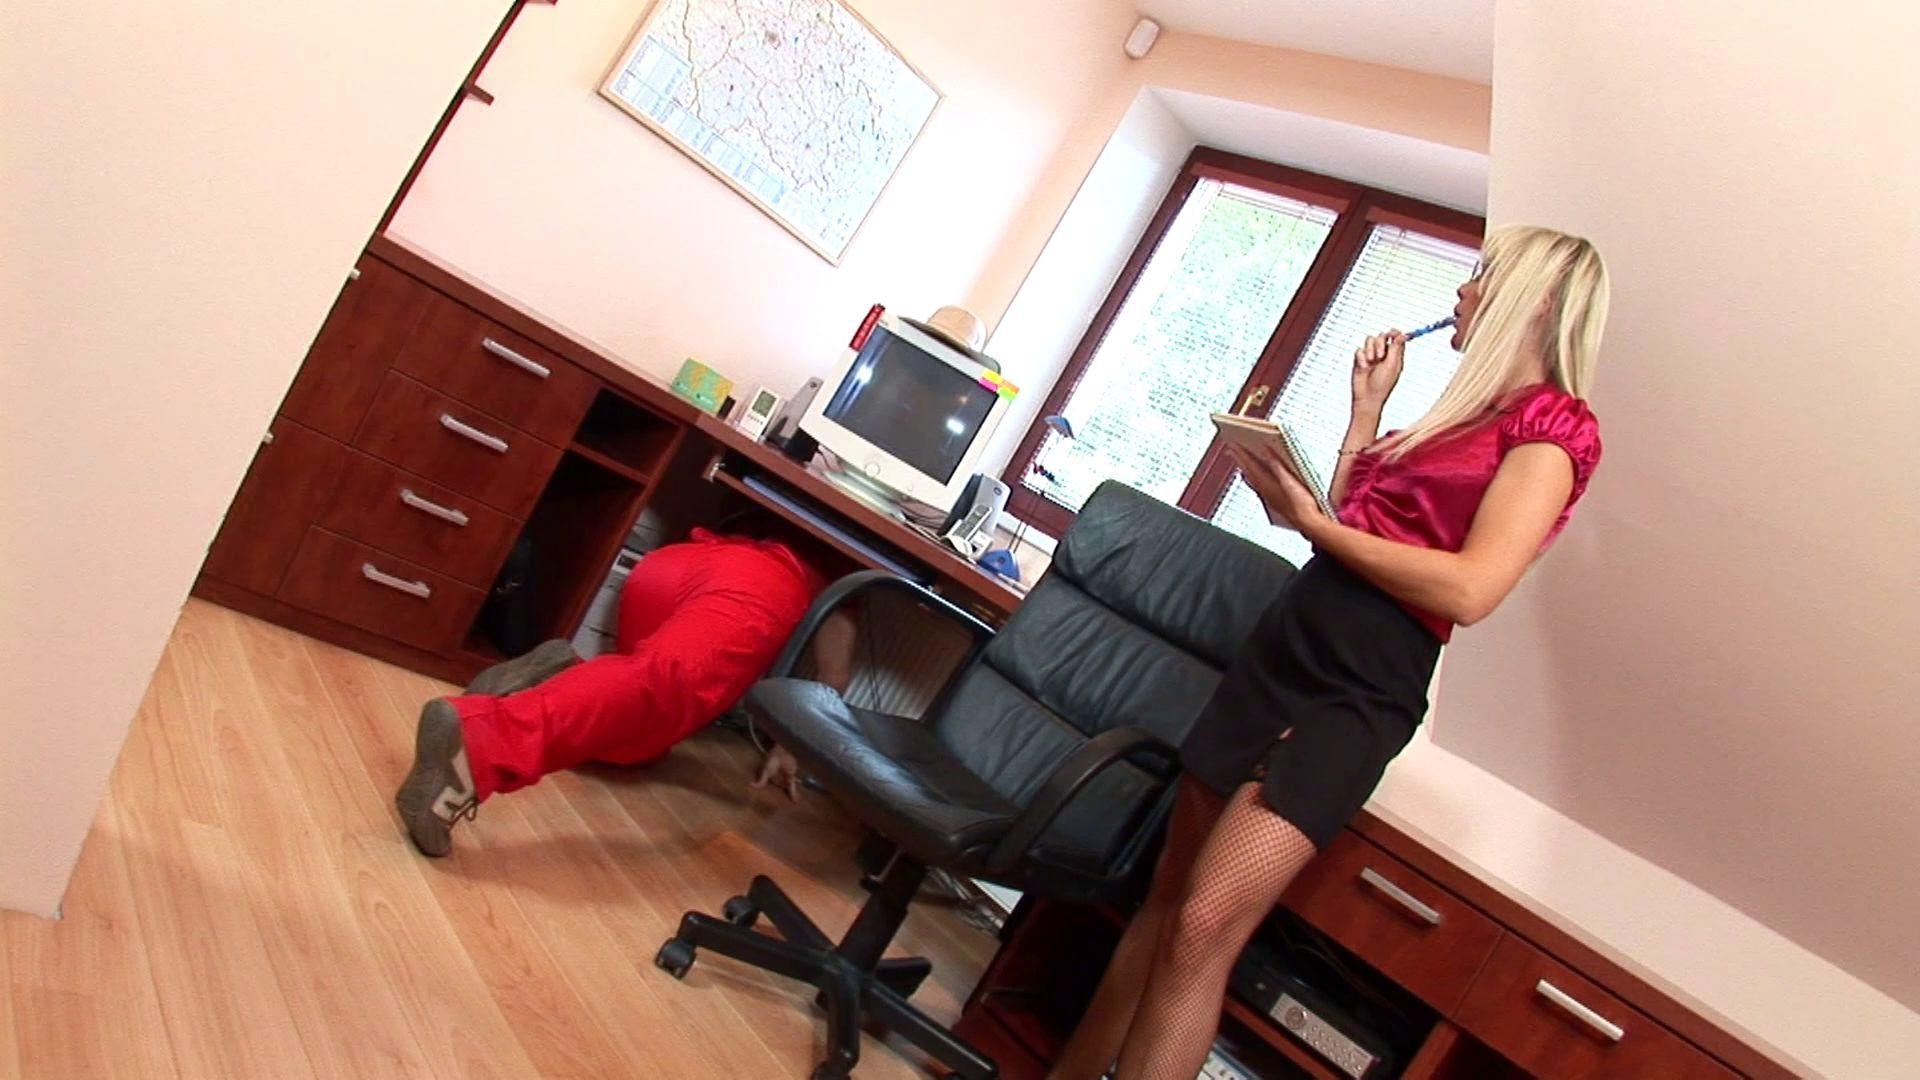 literoica-boss-fuck-employee-wifetures-upskirts-wife